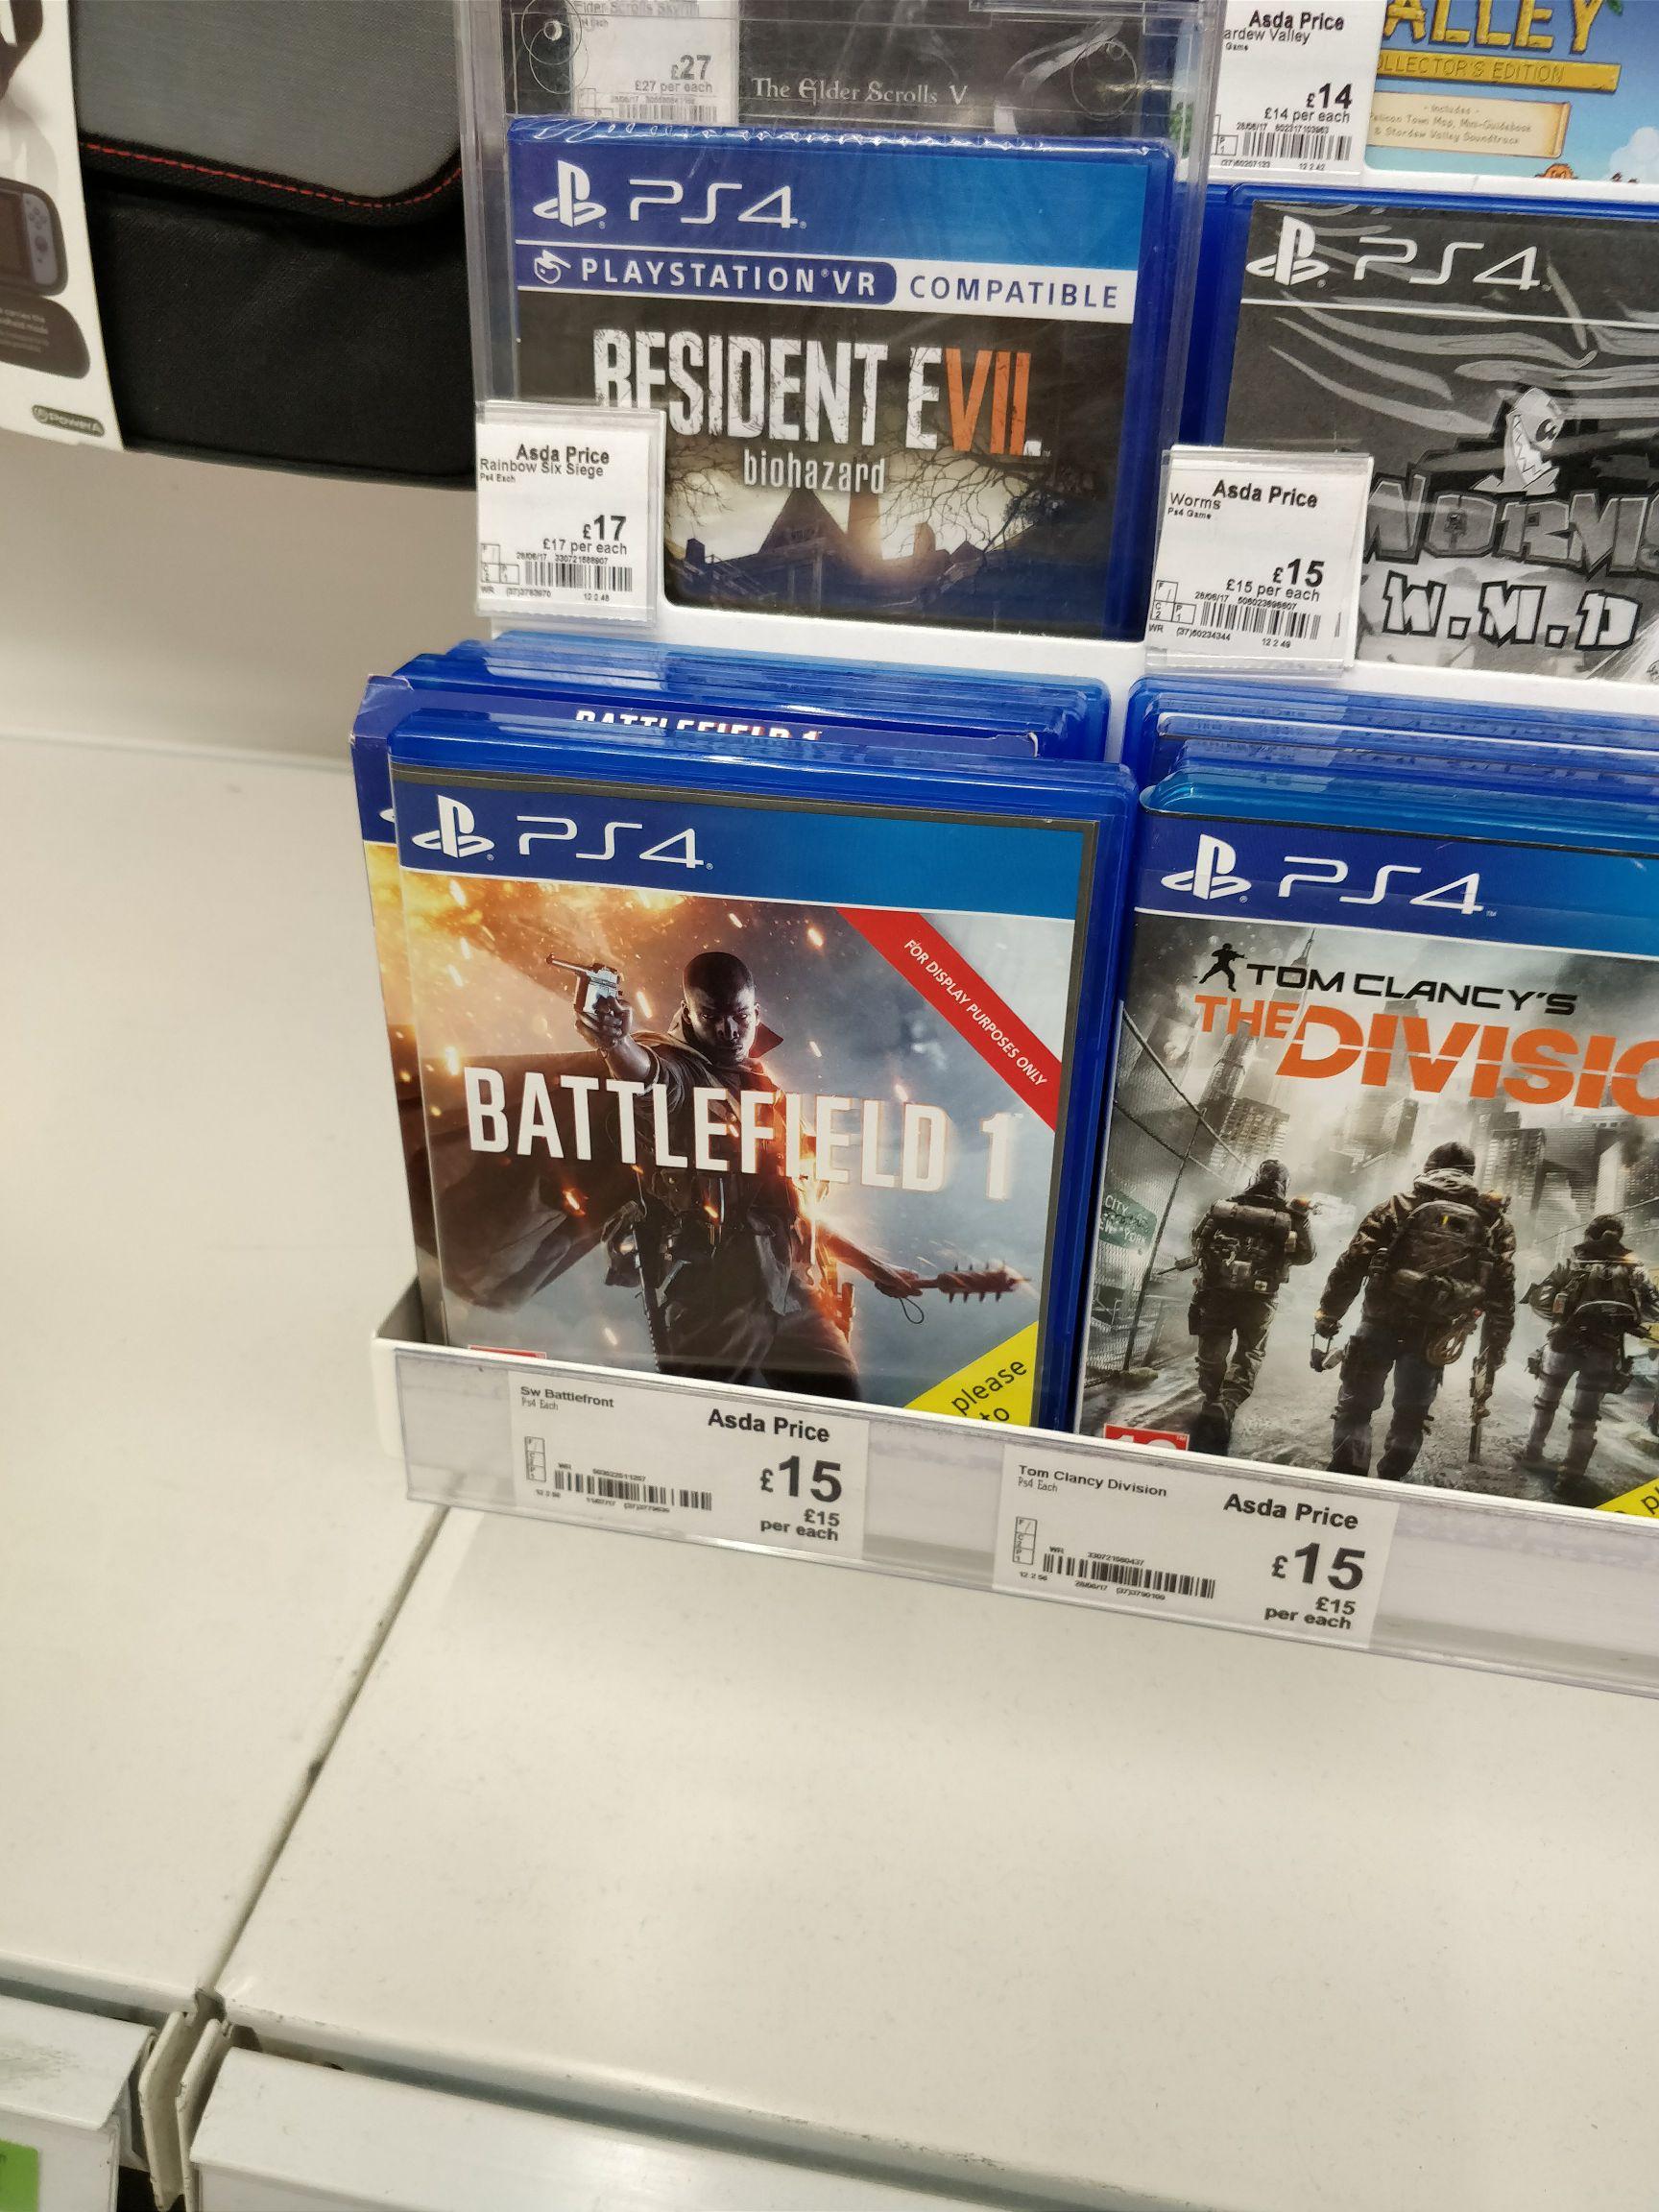 Battlefield 1 PS4 £15 - ASDA